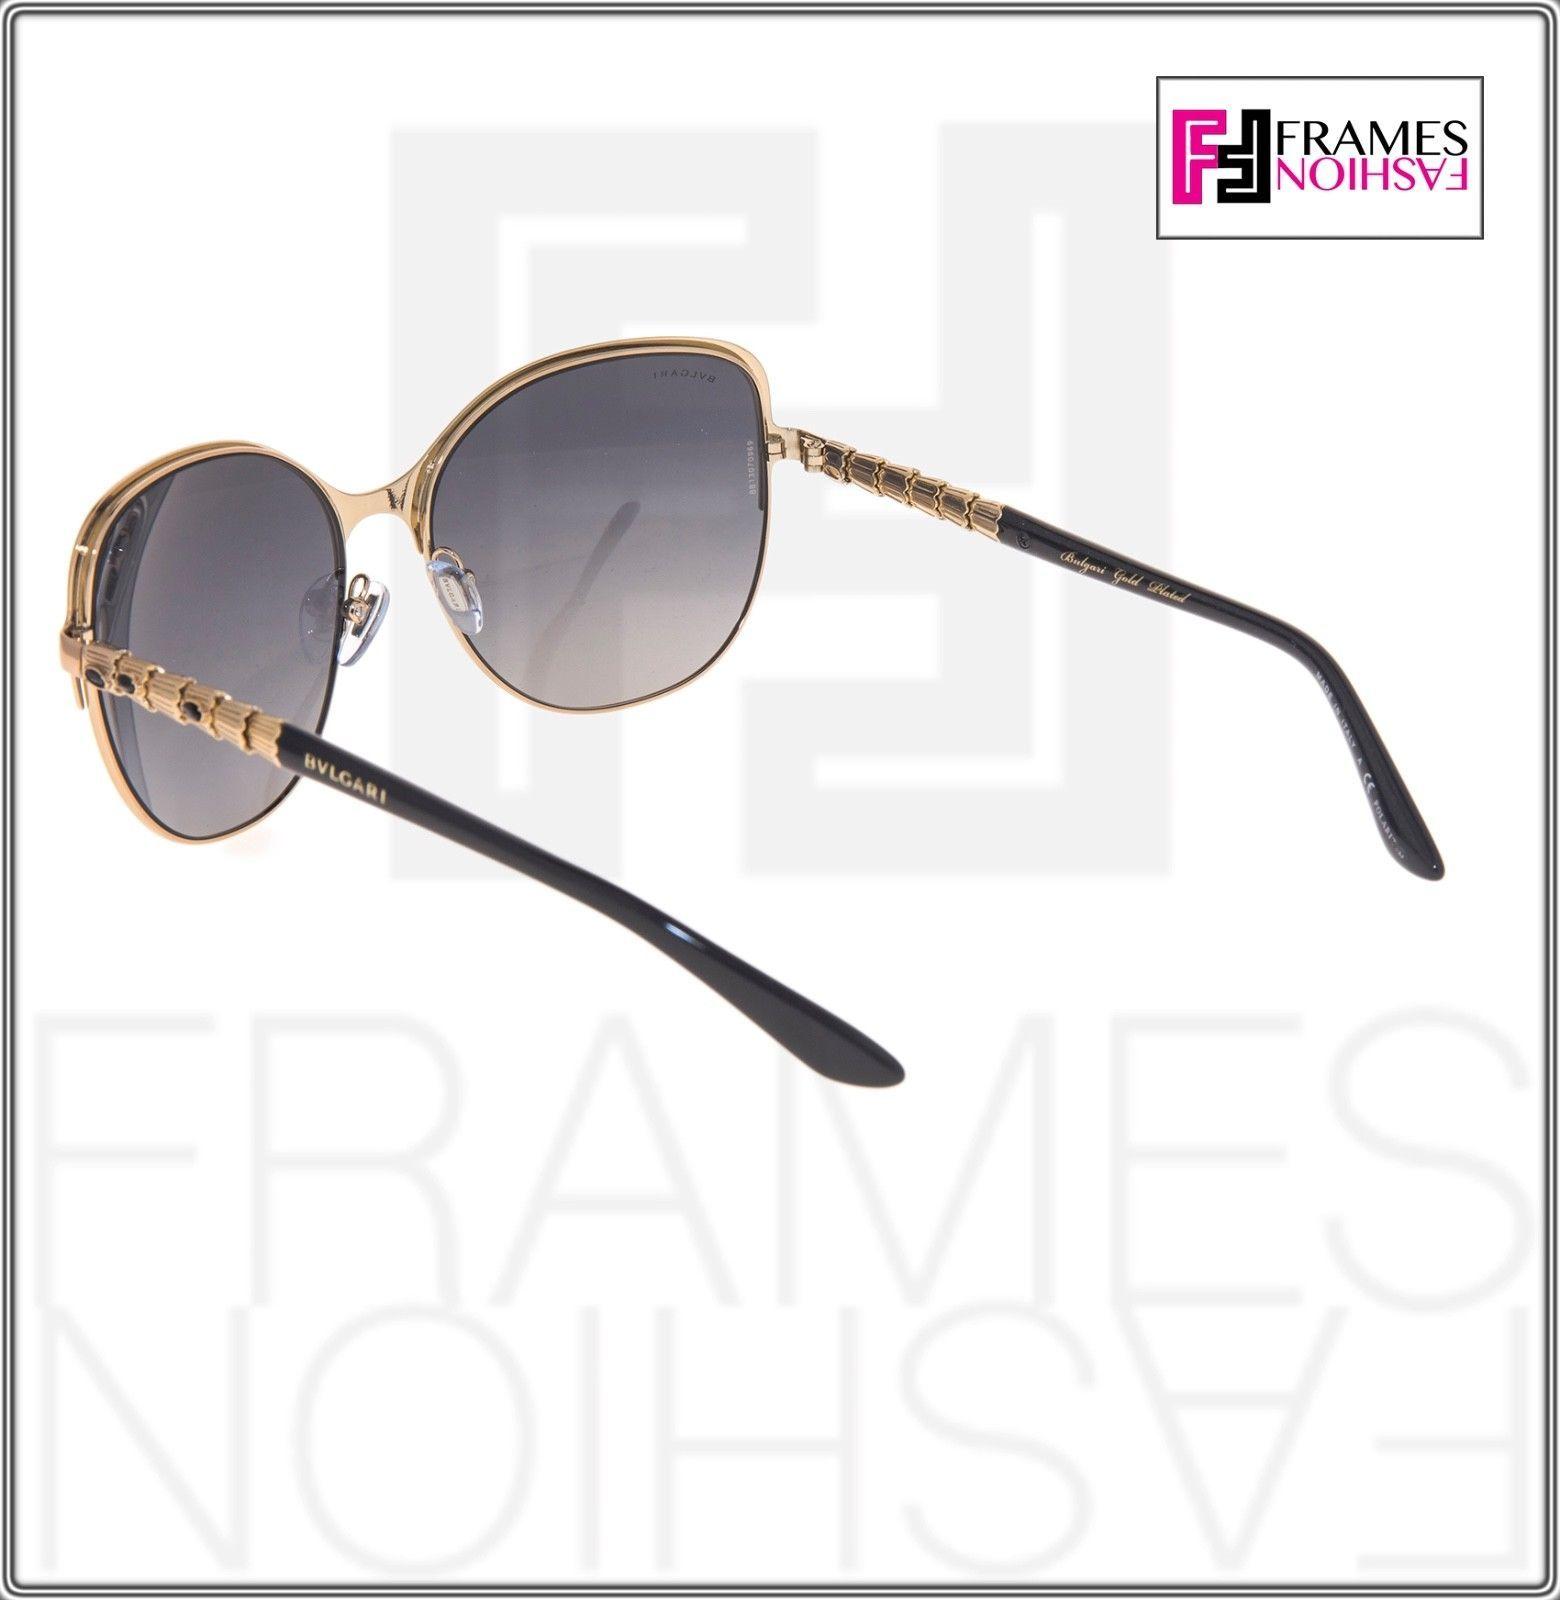 BVLGARI Le Gemme BV6078KB Black Gold 18K Plated POLARIZED Sunglasses 6078 Women image 3